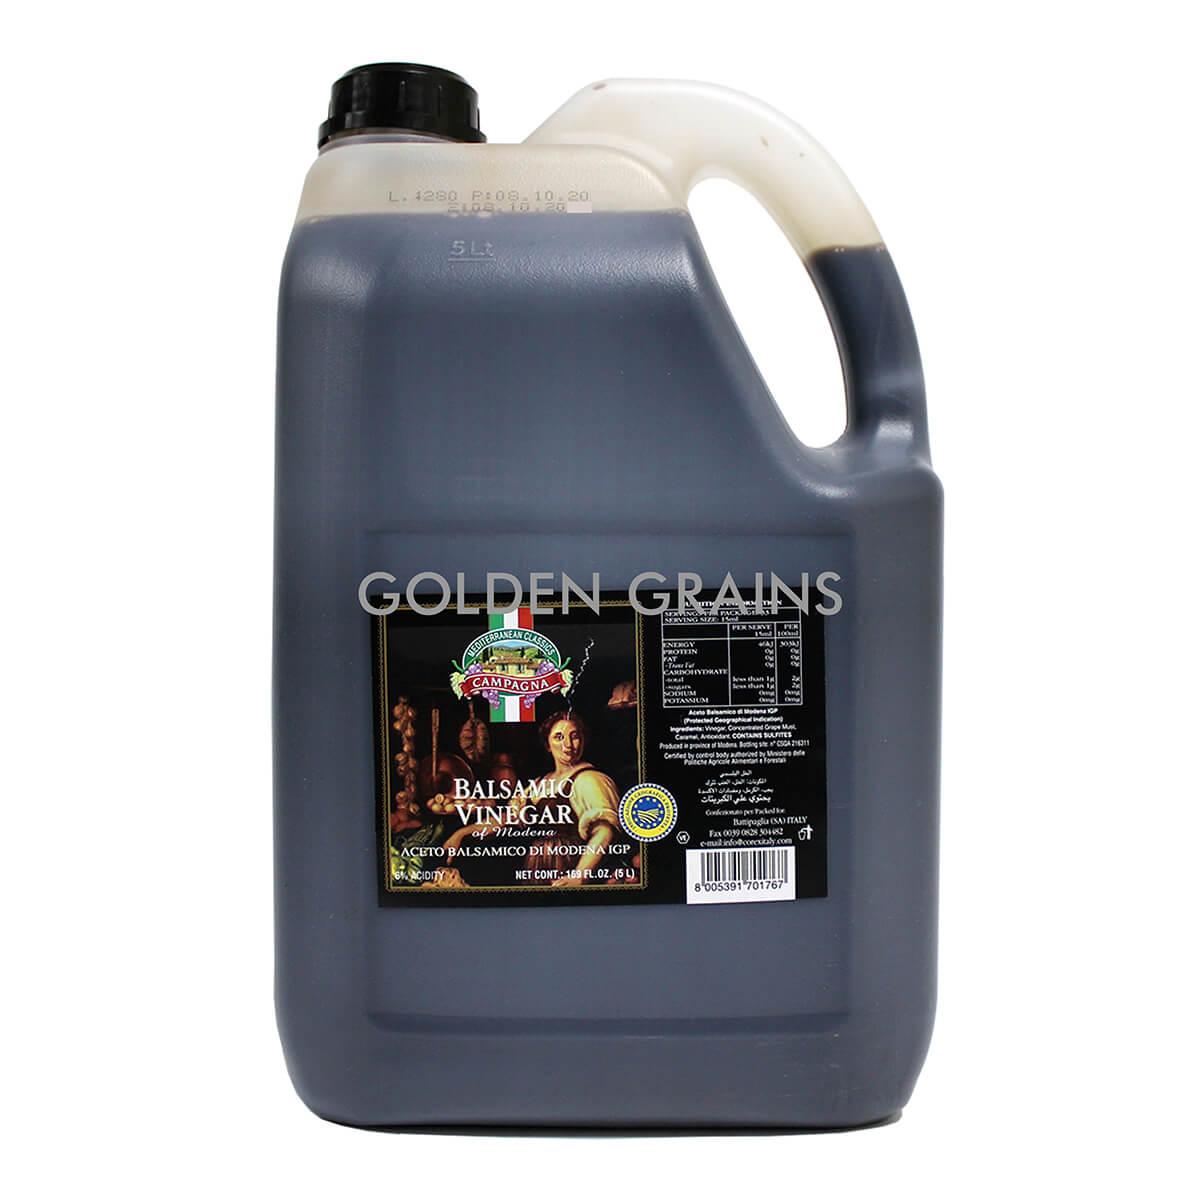 Golden Grains Campagna - Balsamic Vinegar in Container - 5LTR - Front.jpg